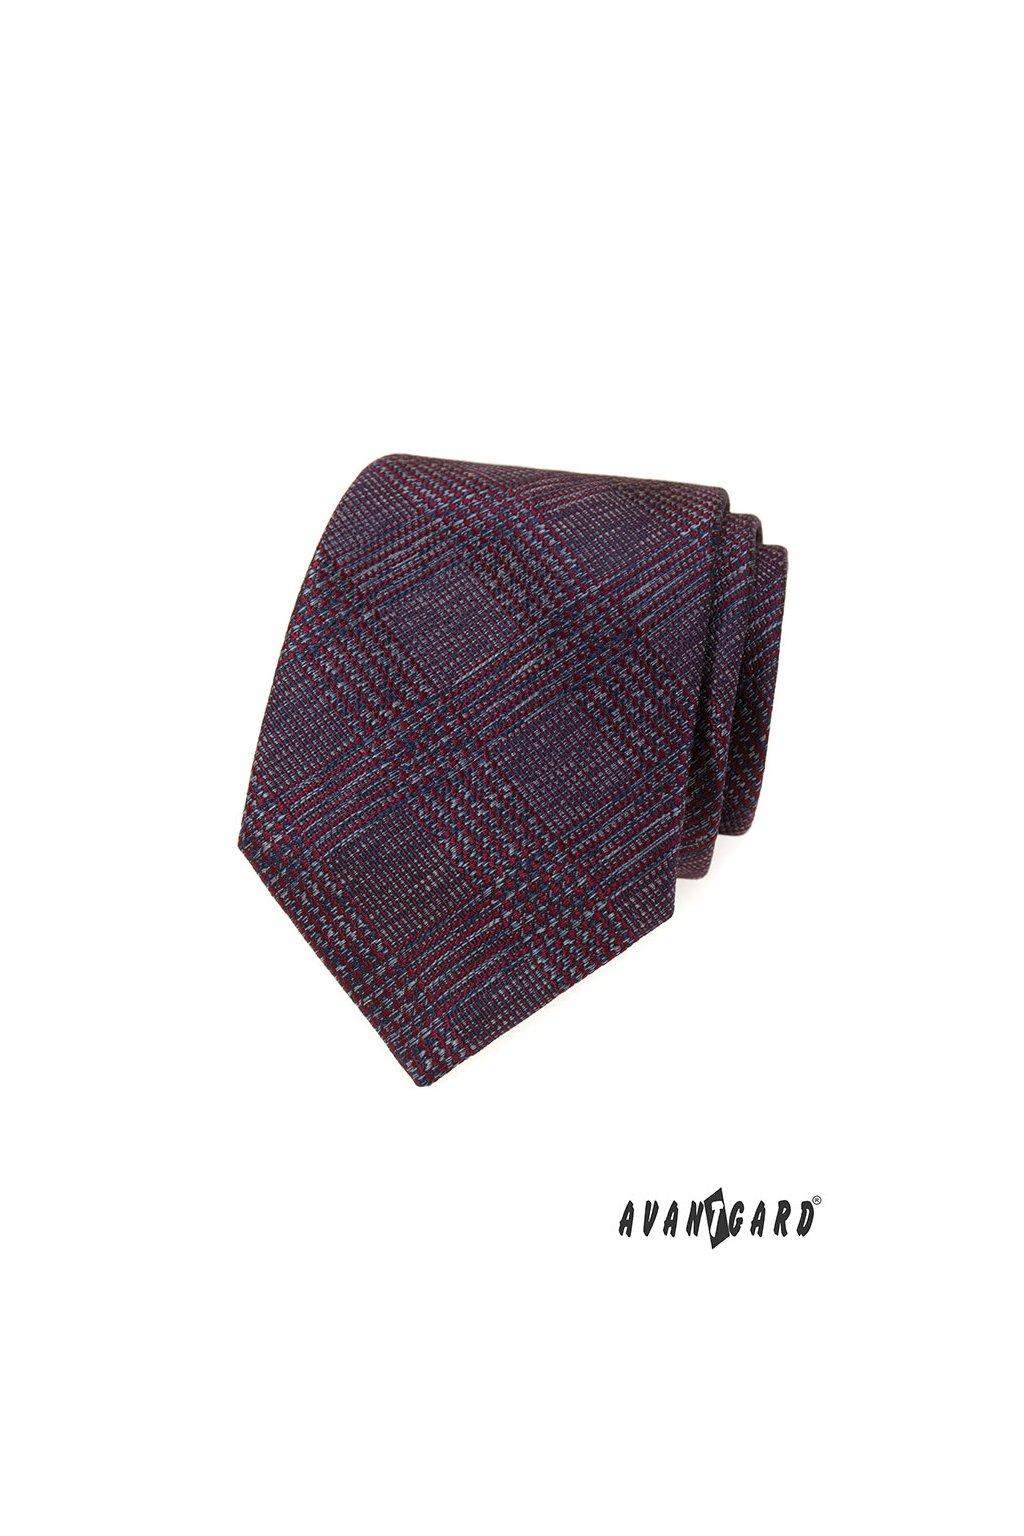 Bordó luxusní kravata vzorovaná 561 - 62311